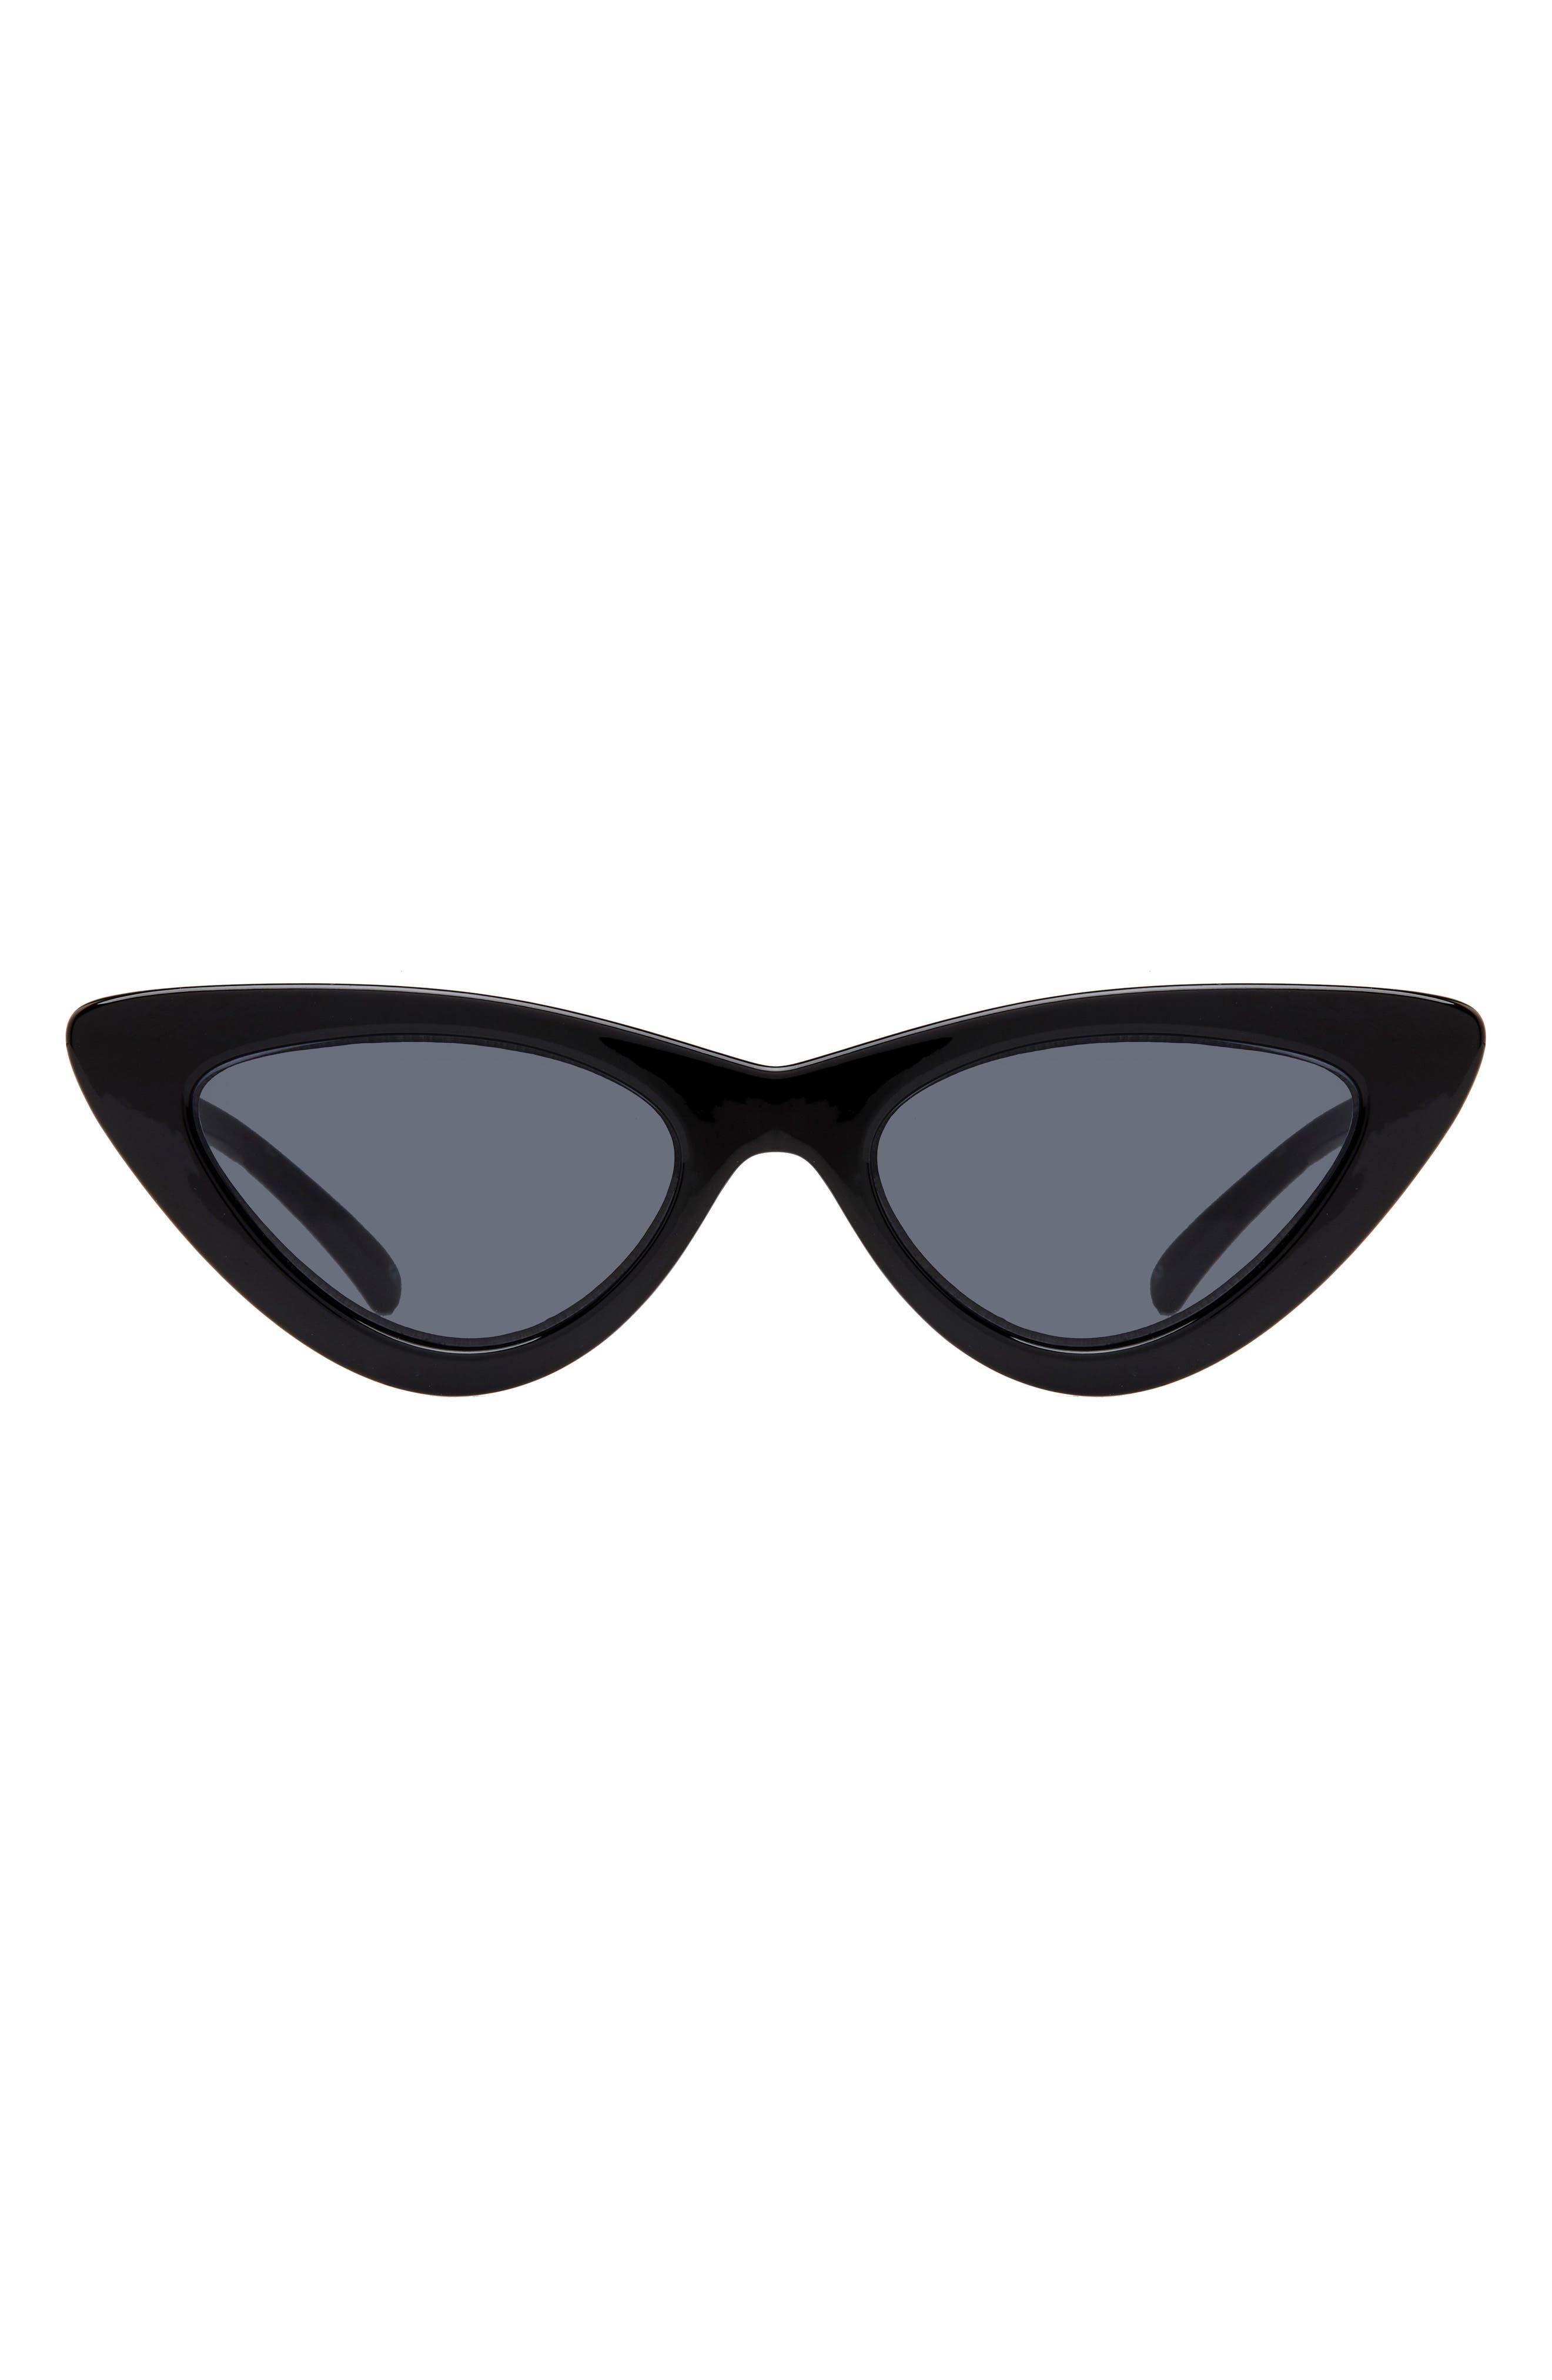 ADAM SELMAN X LE SPECS LUXE, Lolita 49mm Cat Eye Sunglasses, Alternate thumbnail 4, color, BLACK